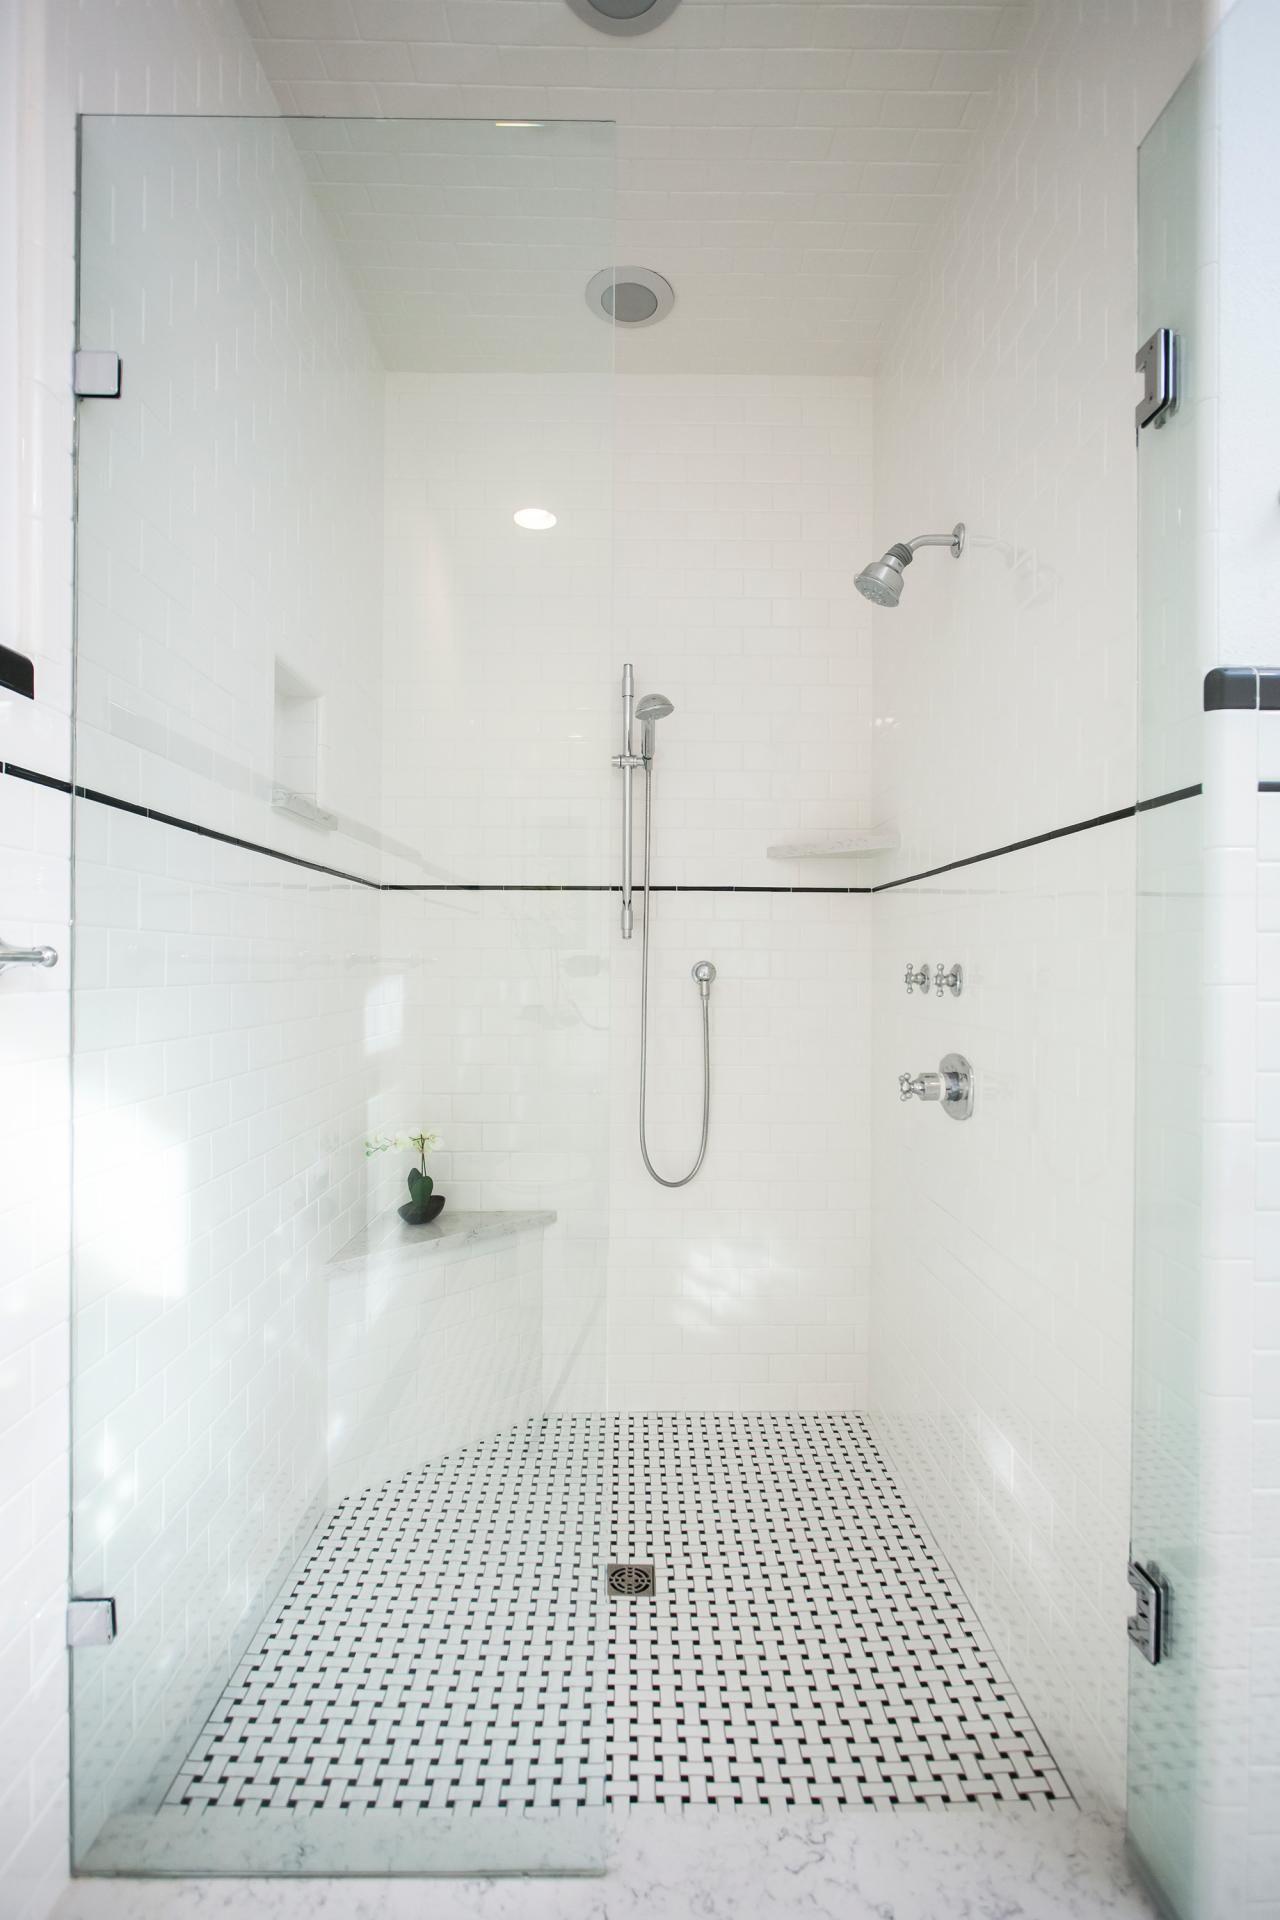 1920s bathroom shower - Google Search   Bathroom Renovation in 2018 ...